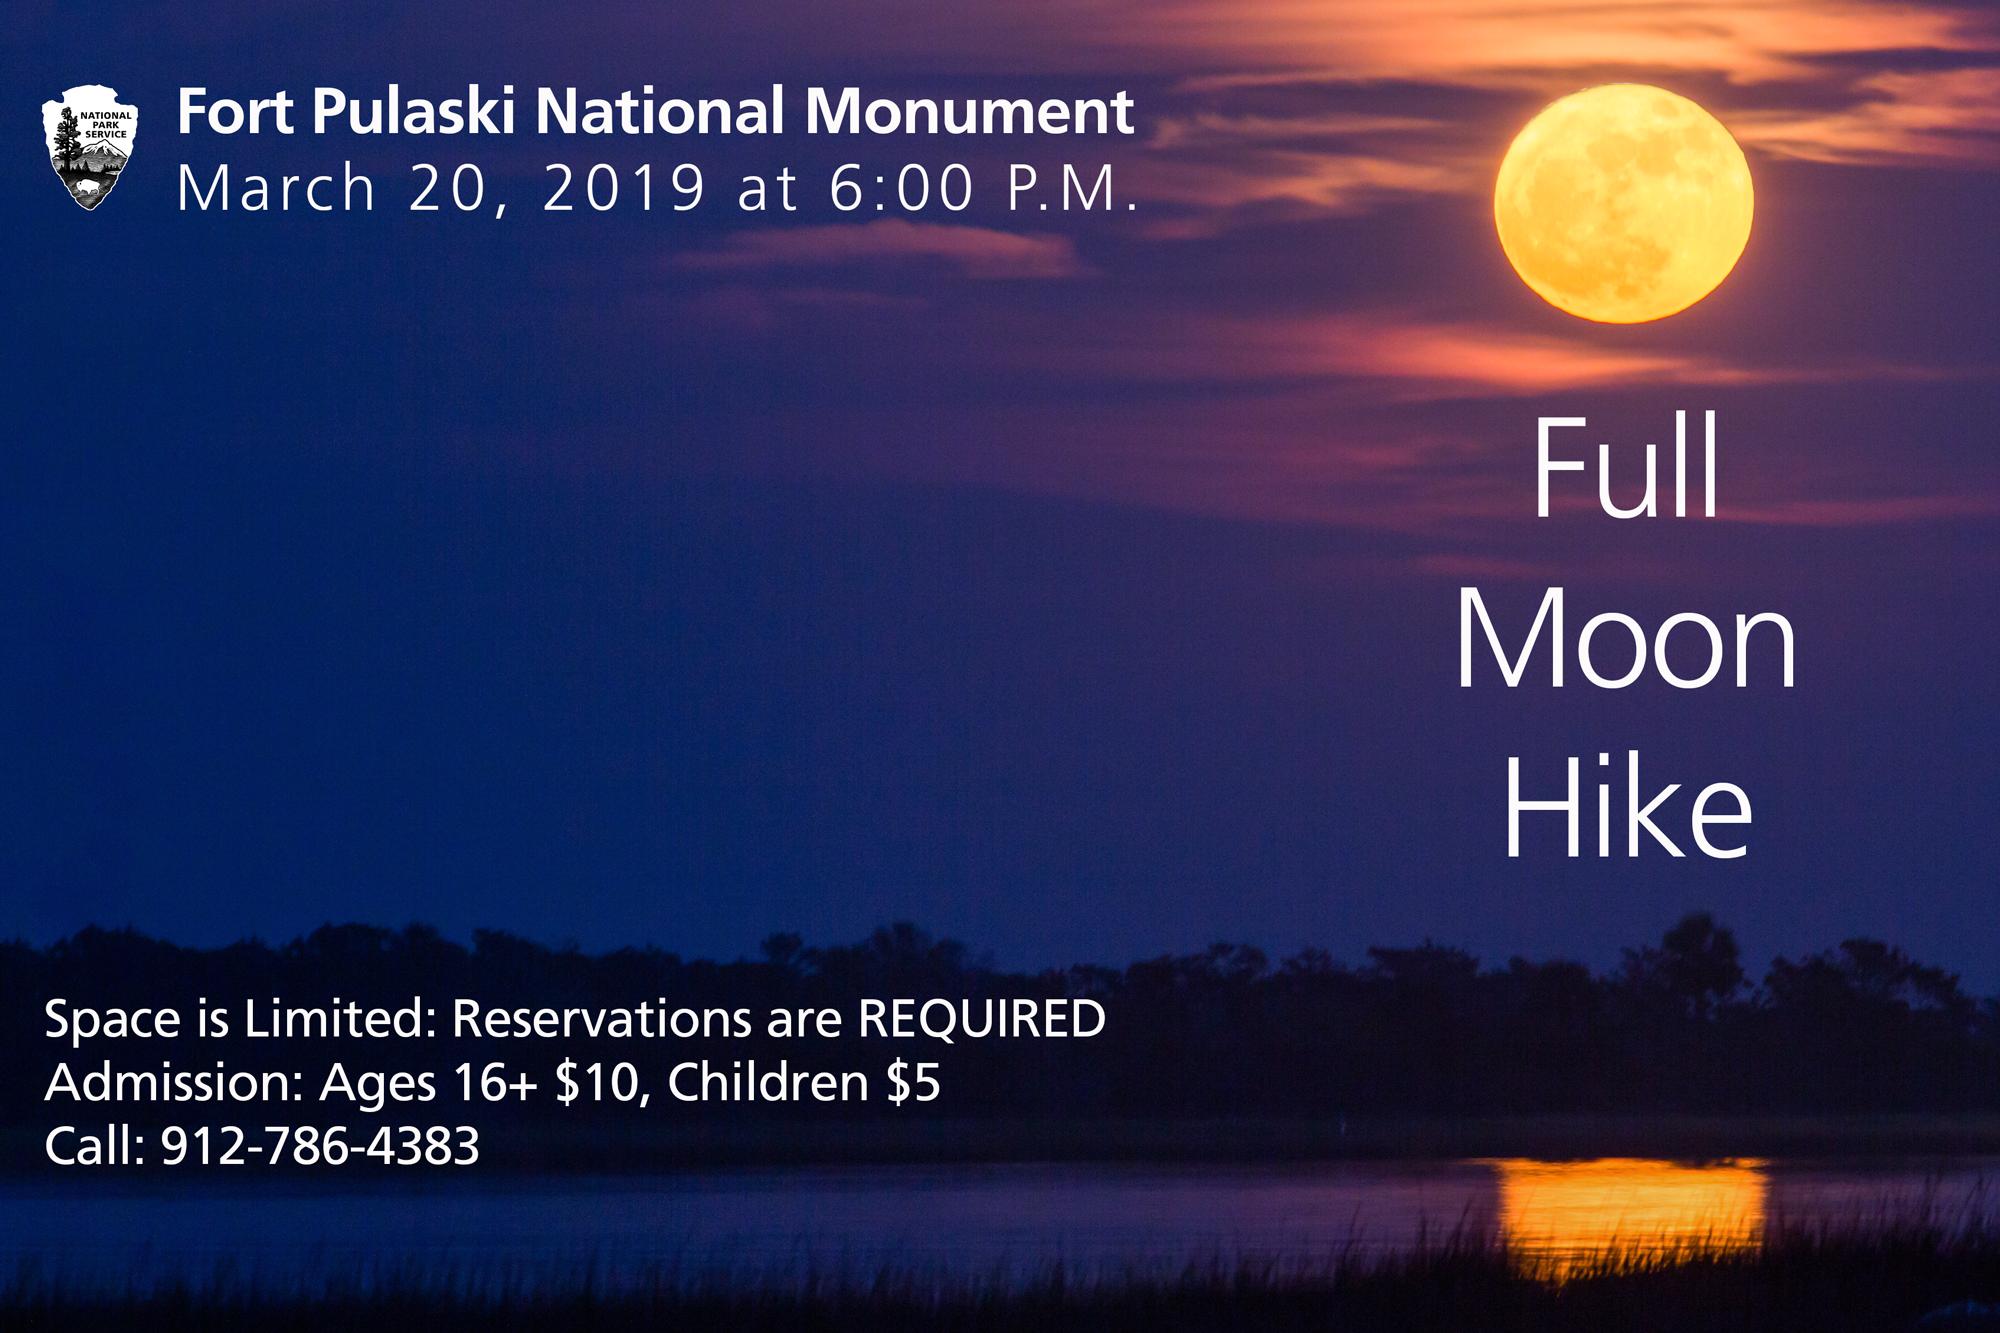 Take a Full Moon Hike at Fort Pulaski - Fort Pulaski